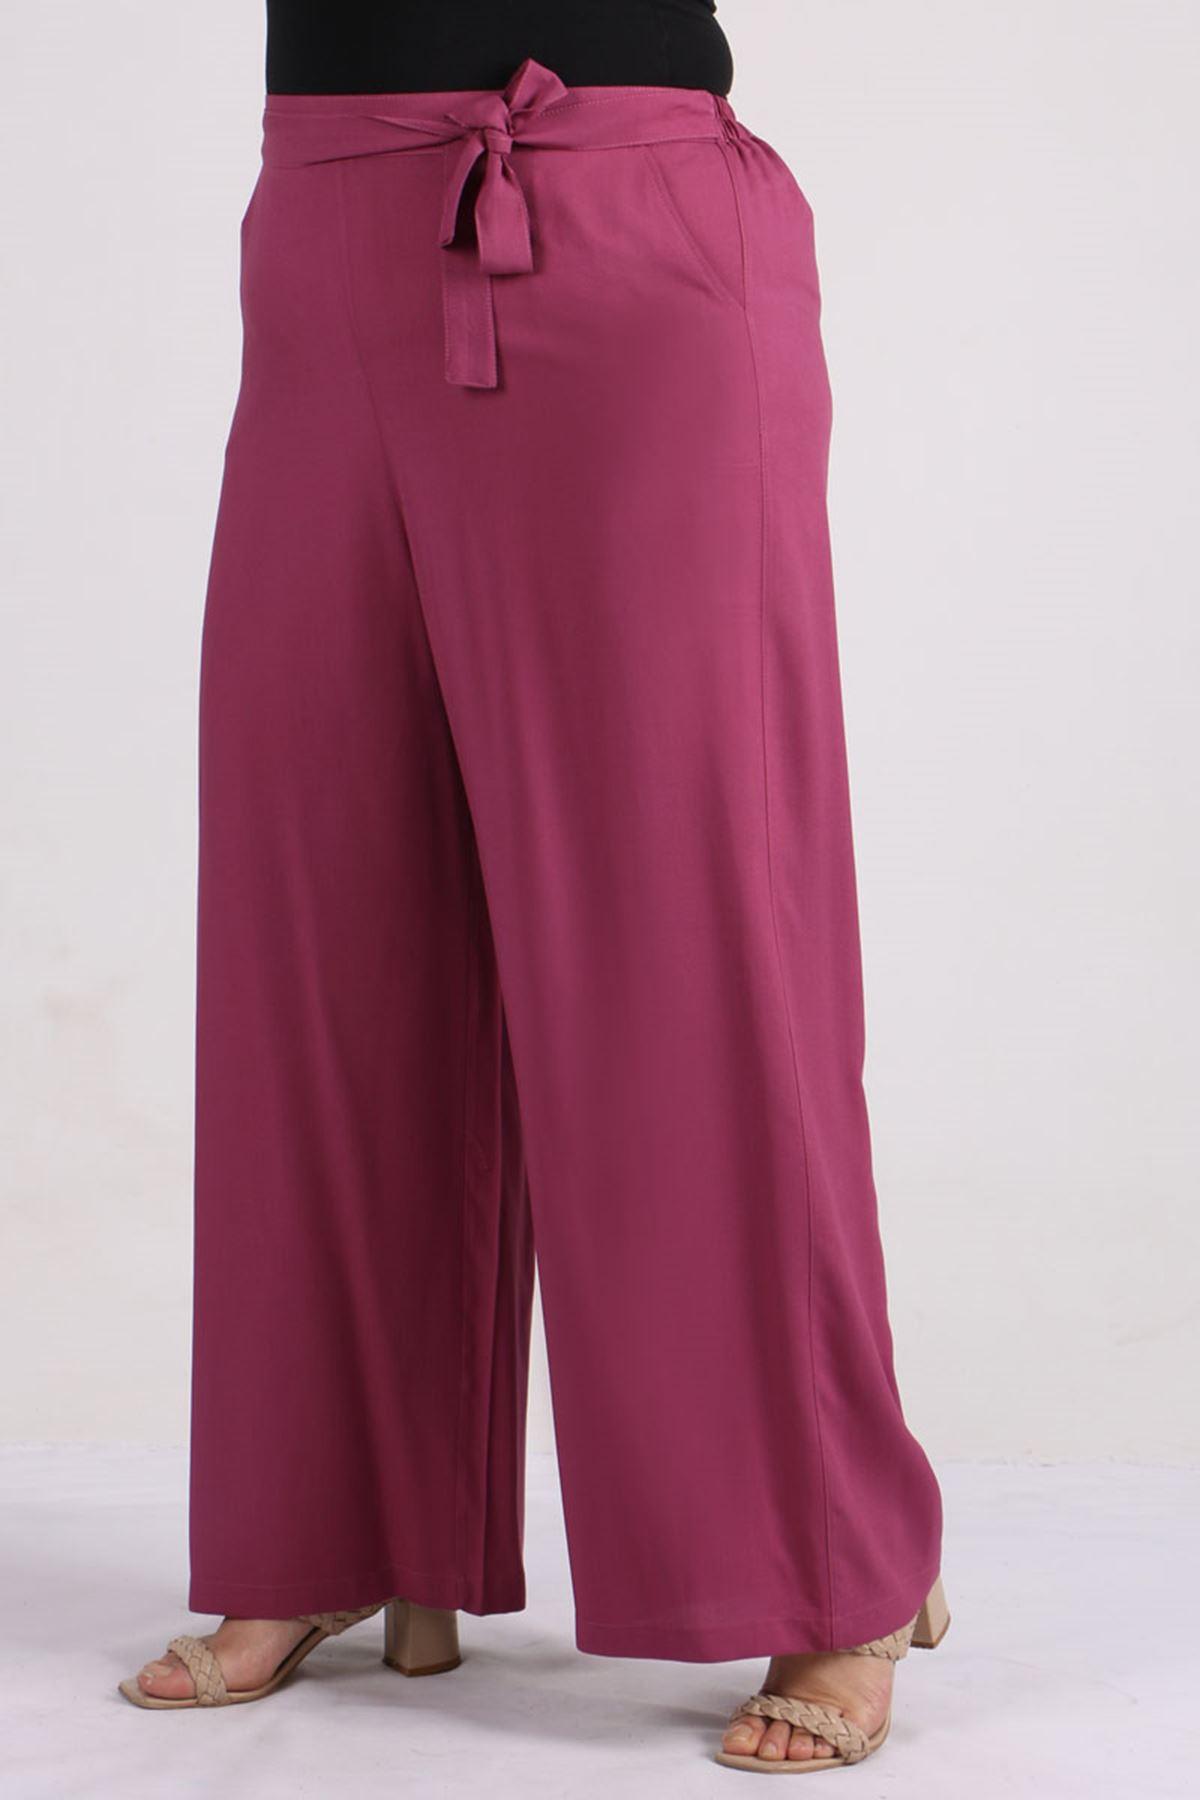 9156 Plus Size Pants - Light Rose